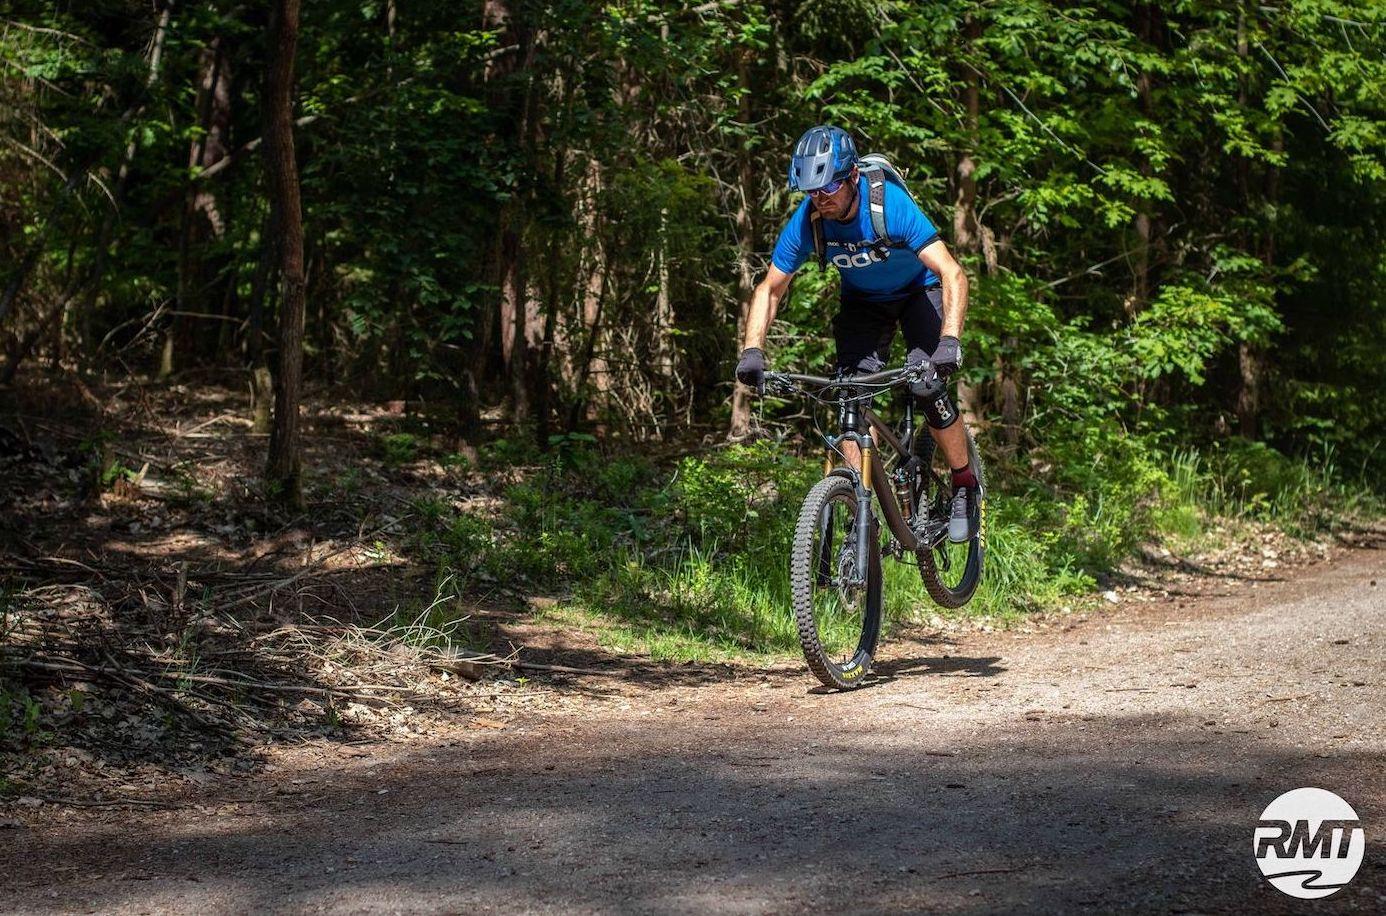 Fortgeschritten Fahrtechnik Kurs Heidelberg - Rock my Trail - Mountainbike Training